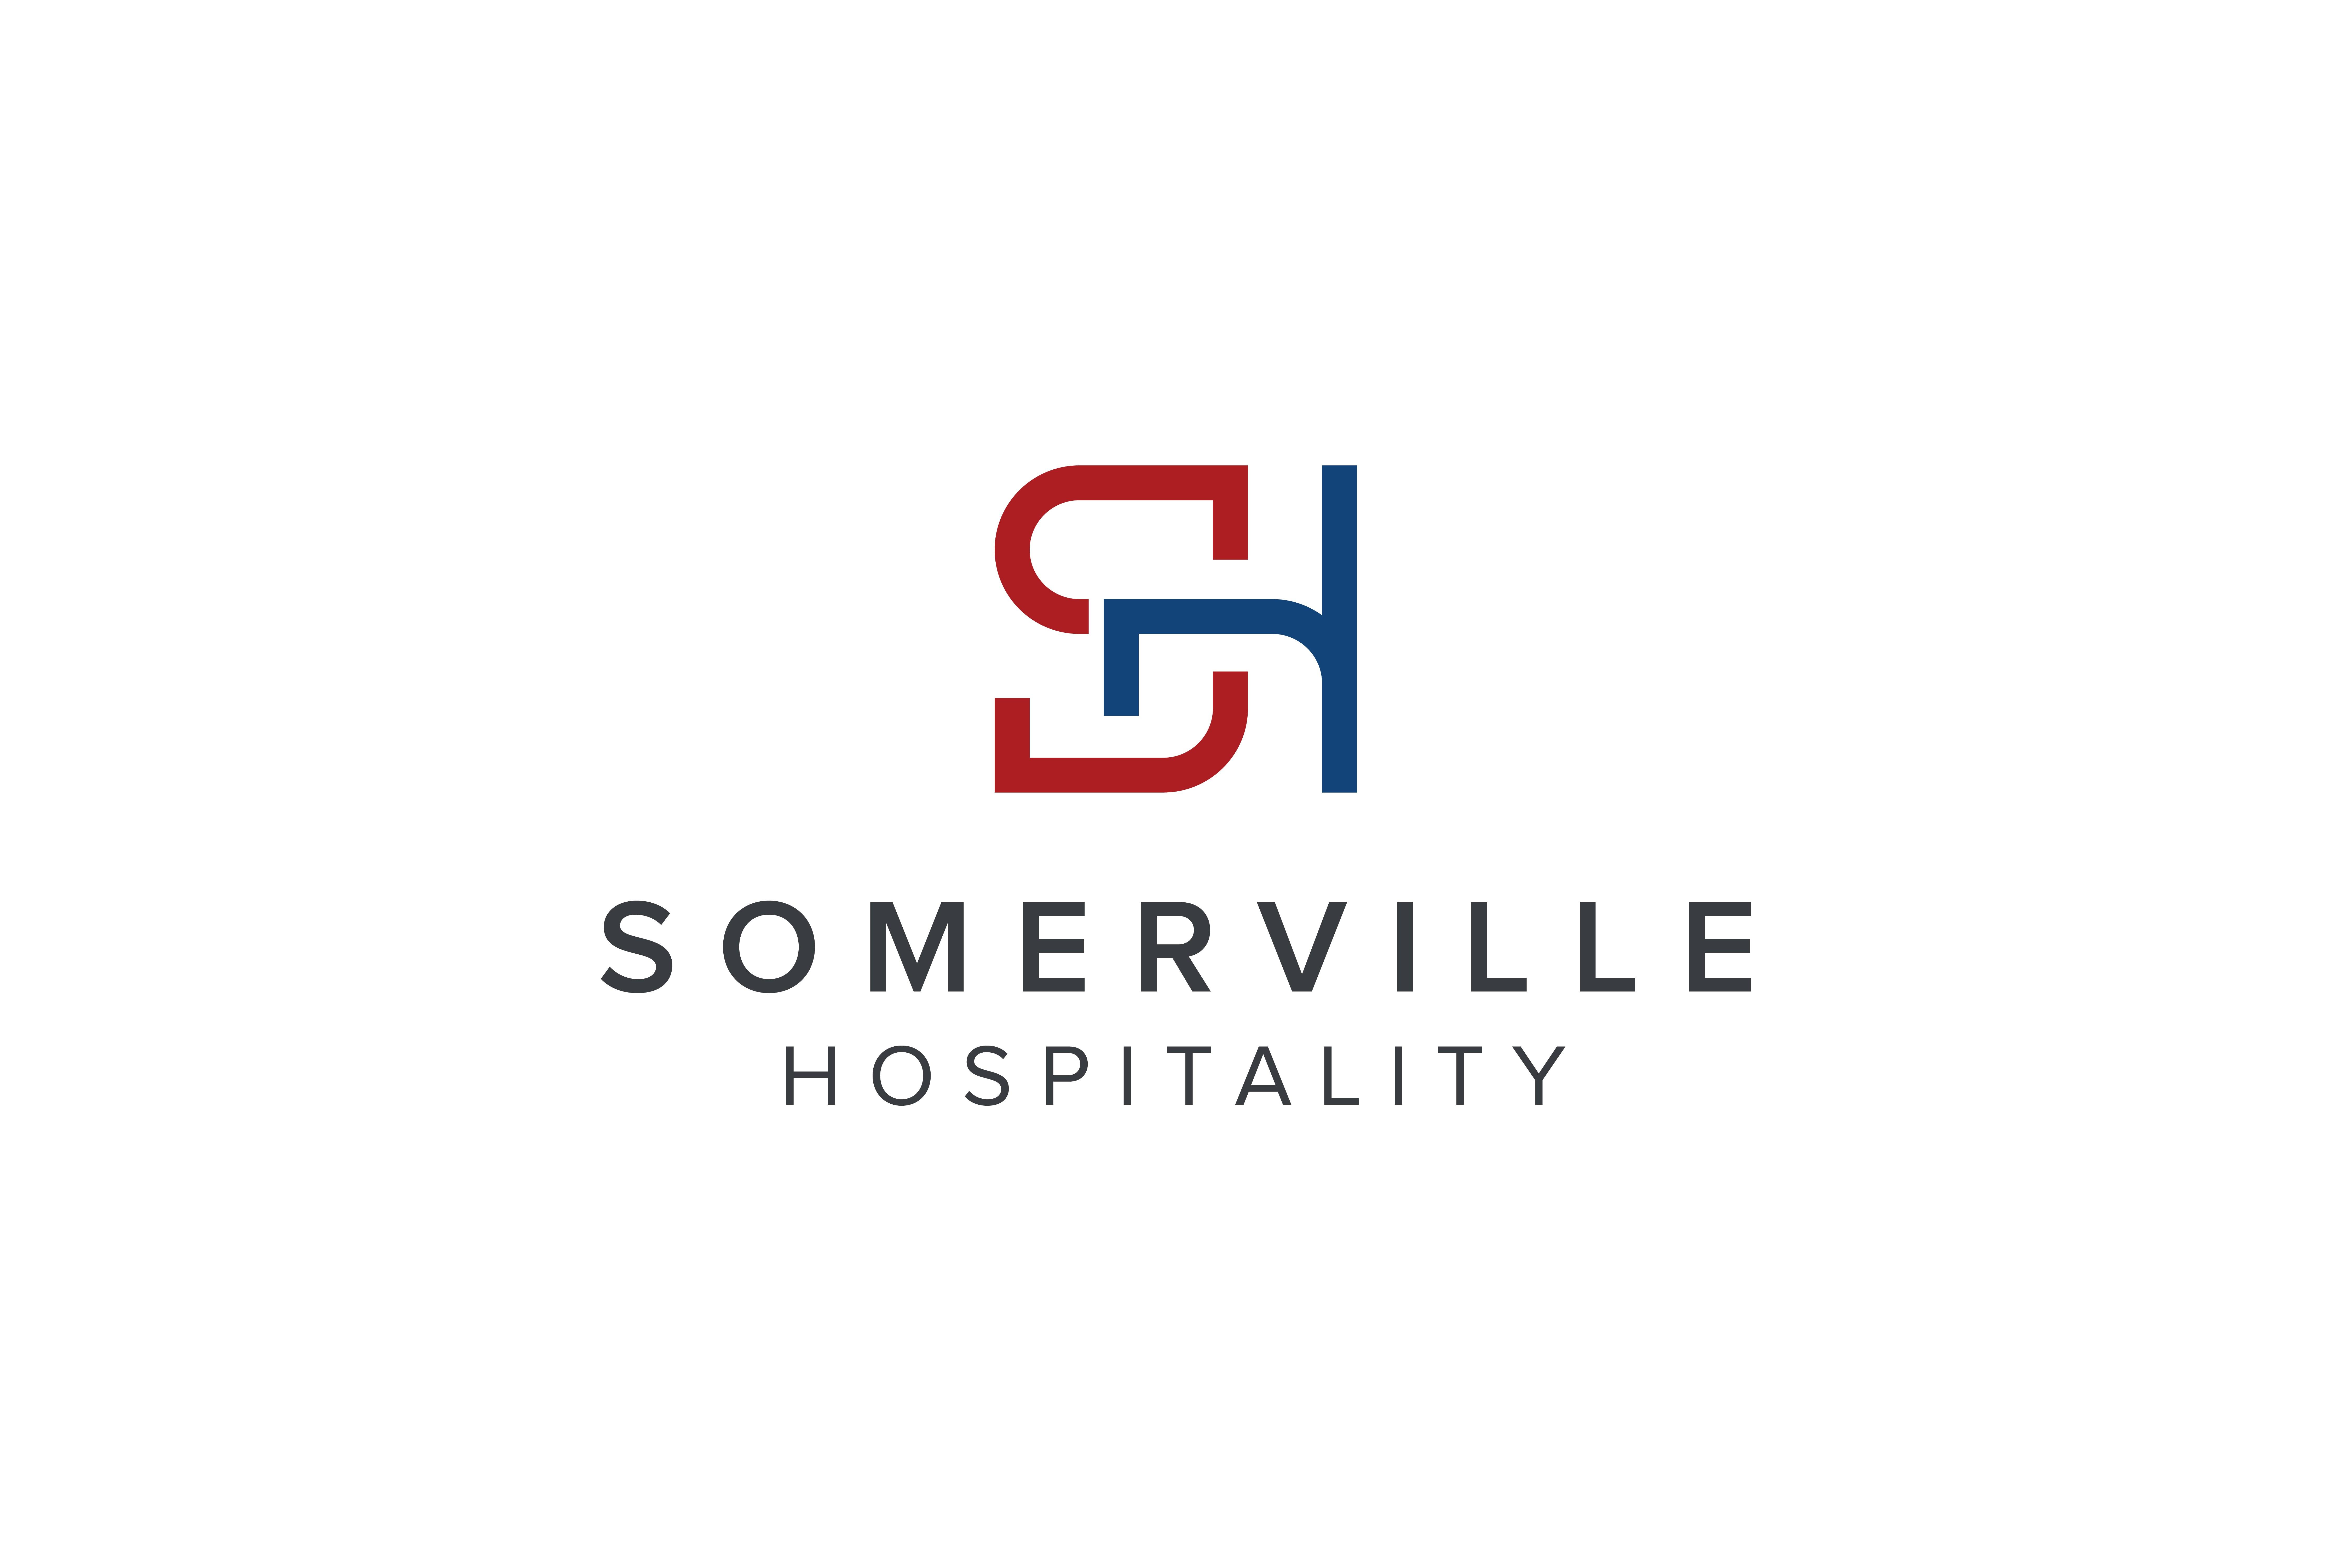 Create an upscale and modern logo for our hospitality company